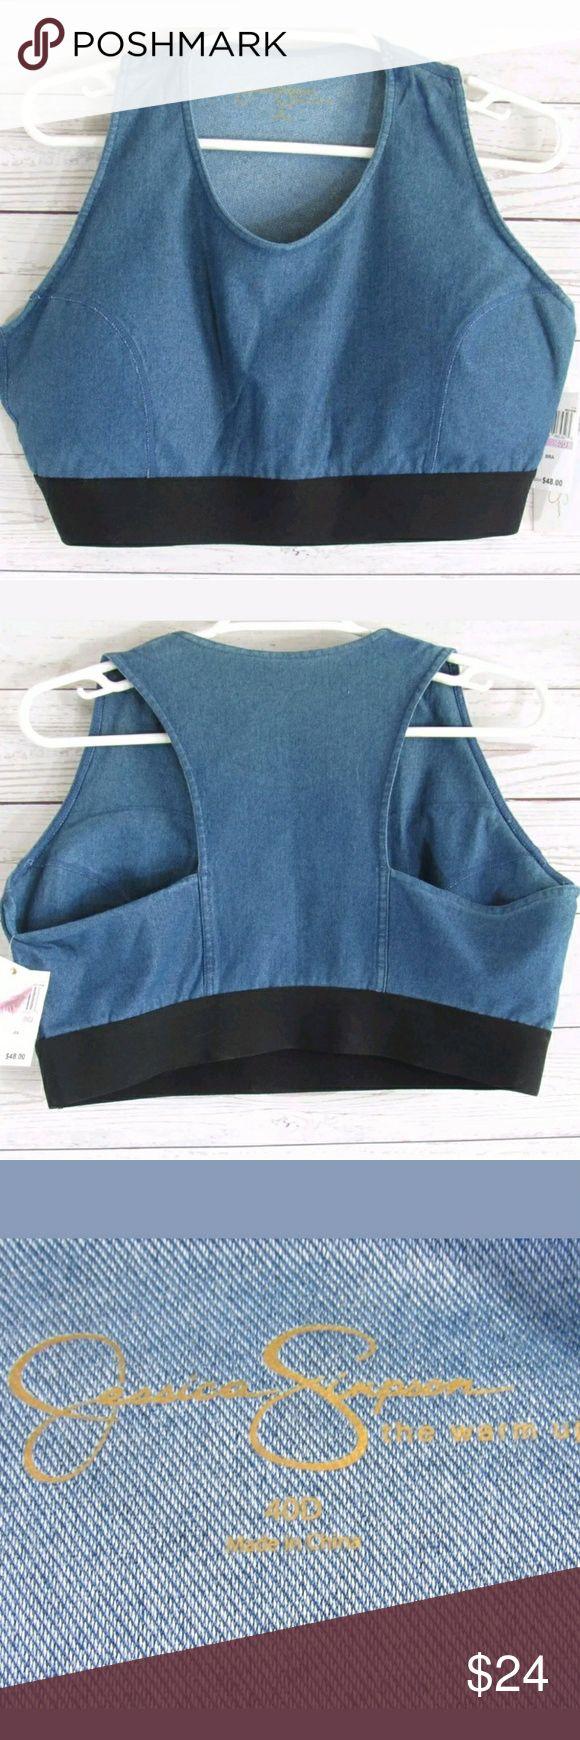 Warm up denim sports bra New with tags. Size 40D MSRP $48.00 Jessica Simpson Intimates & Sleepwear Bras